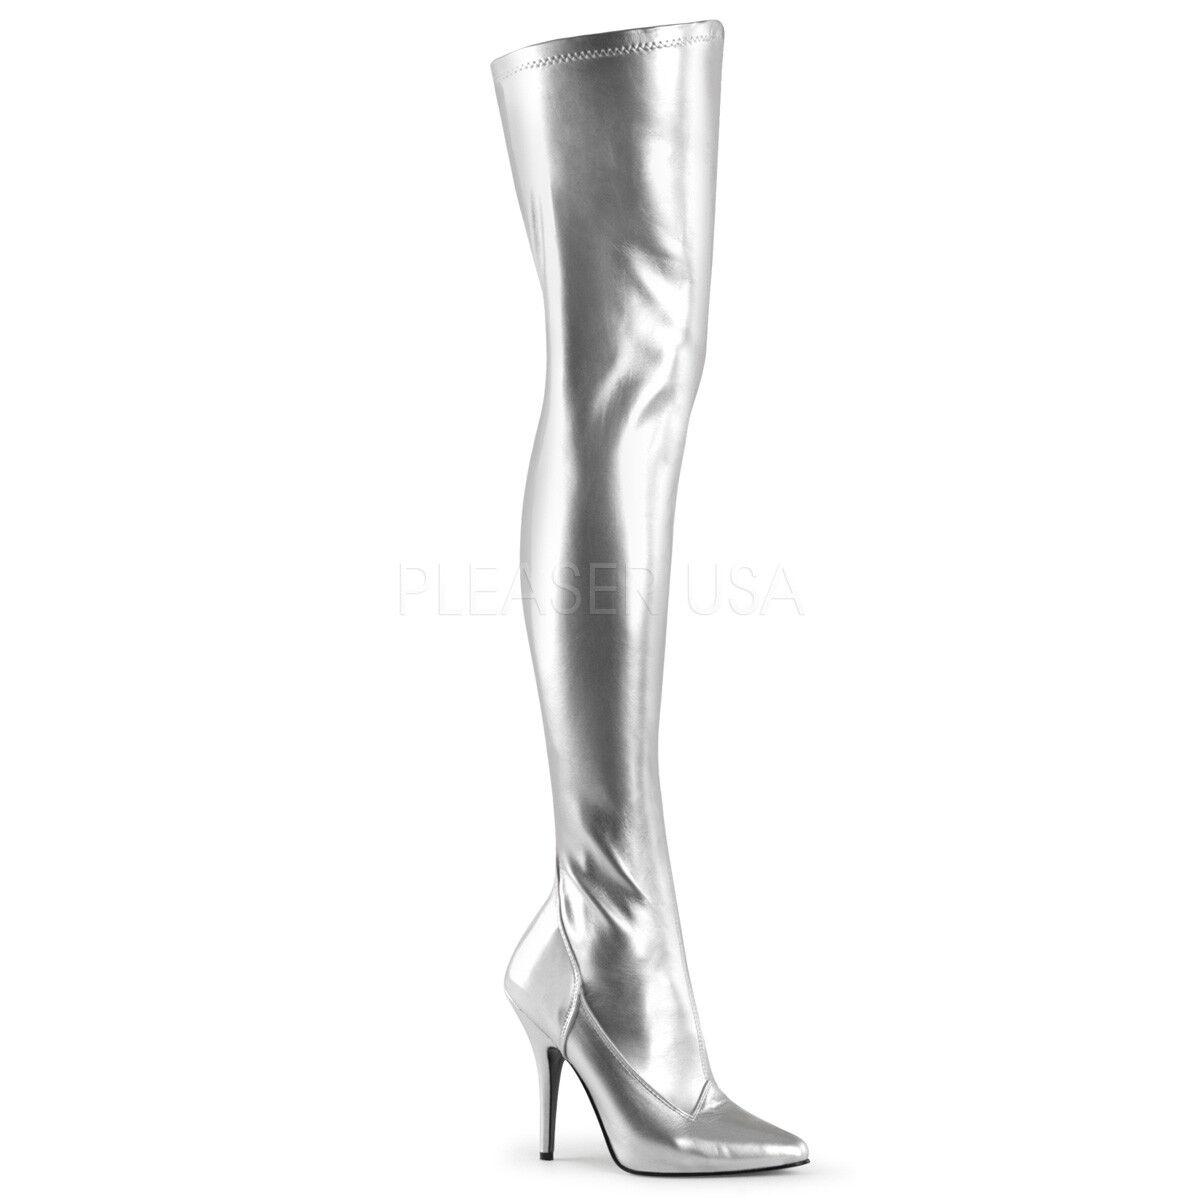 PLEASER - Seduce-3000 Stiefel Single Sole Thigh High Stiefel Seduce-3000 With Side Zipper d18fb5